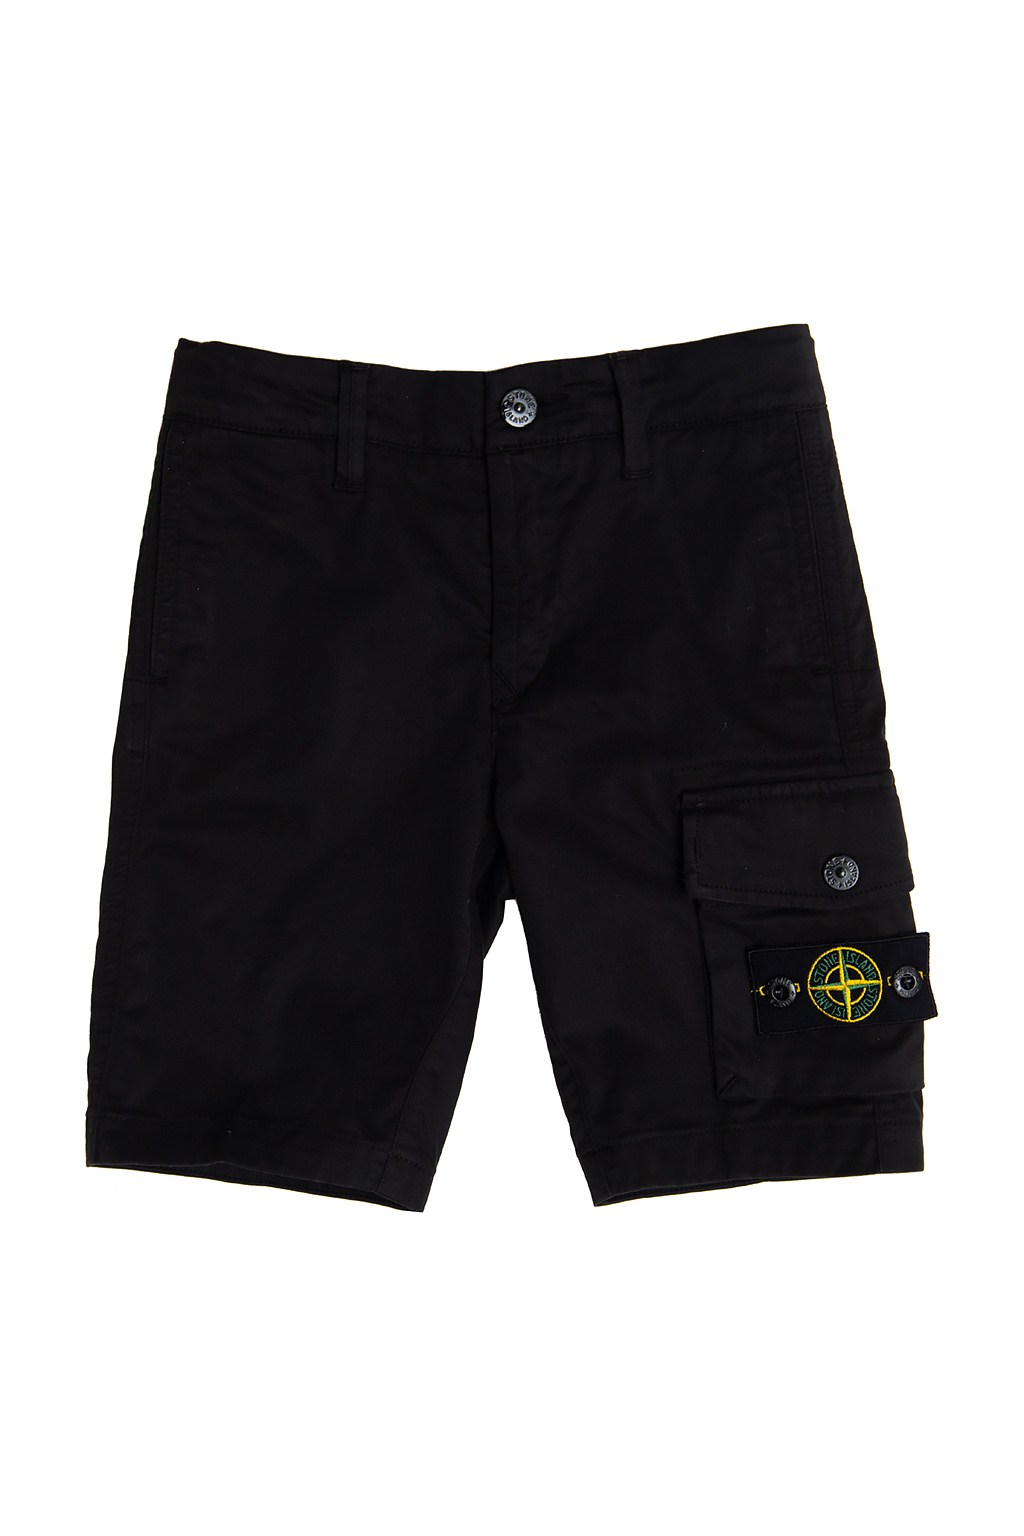 Stone Island Kids 棉质短裤